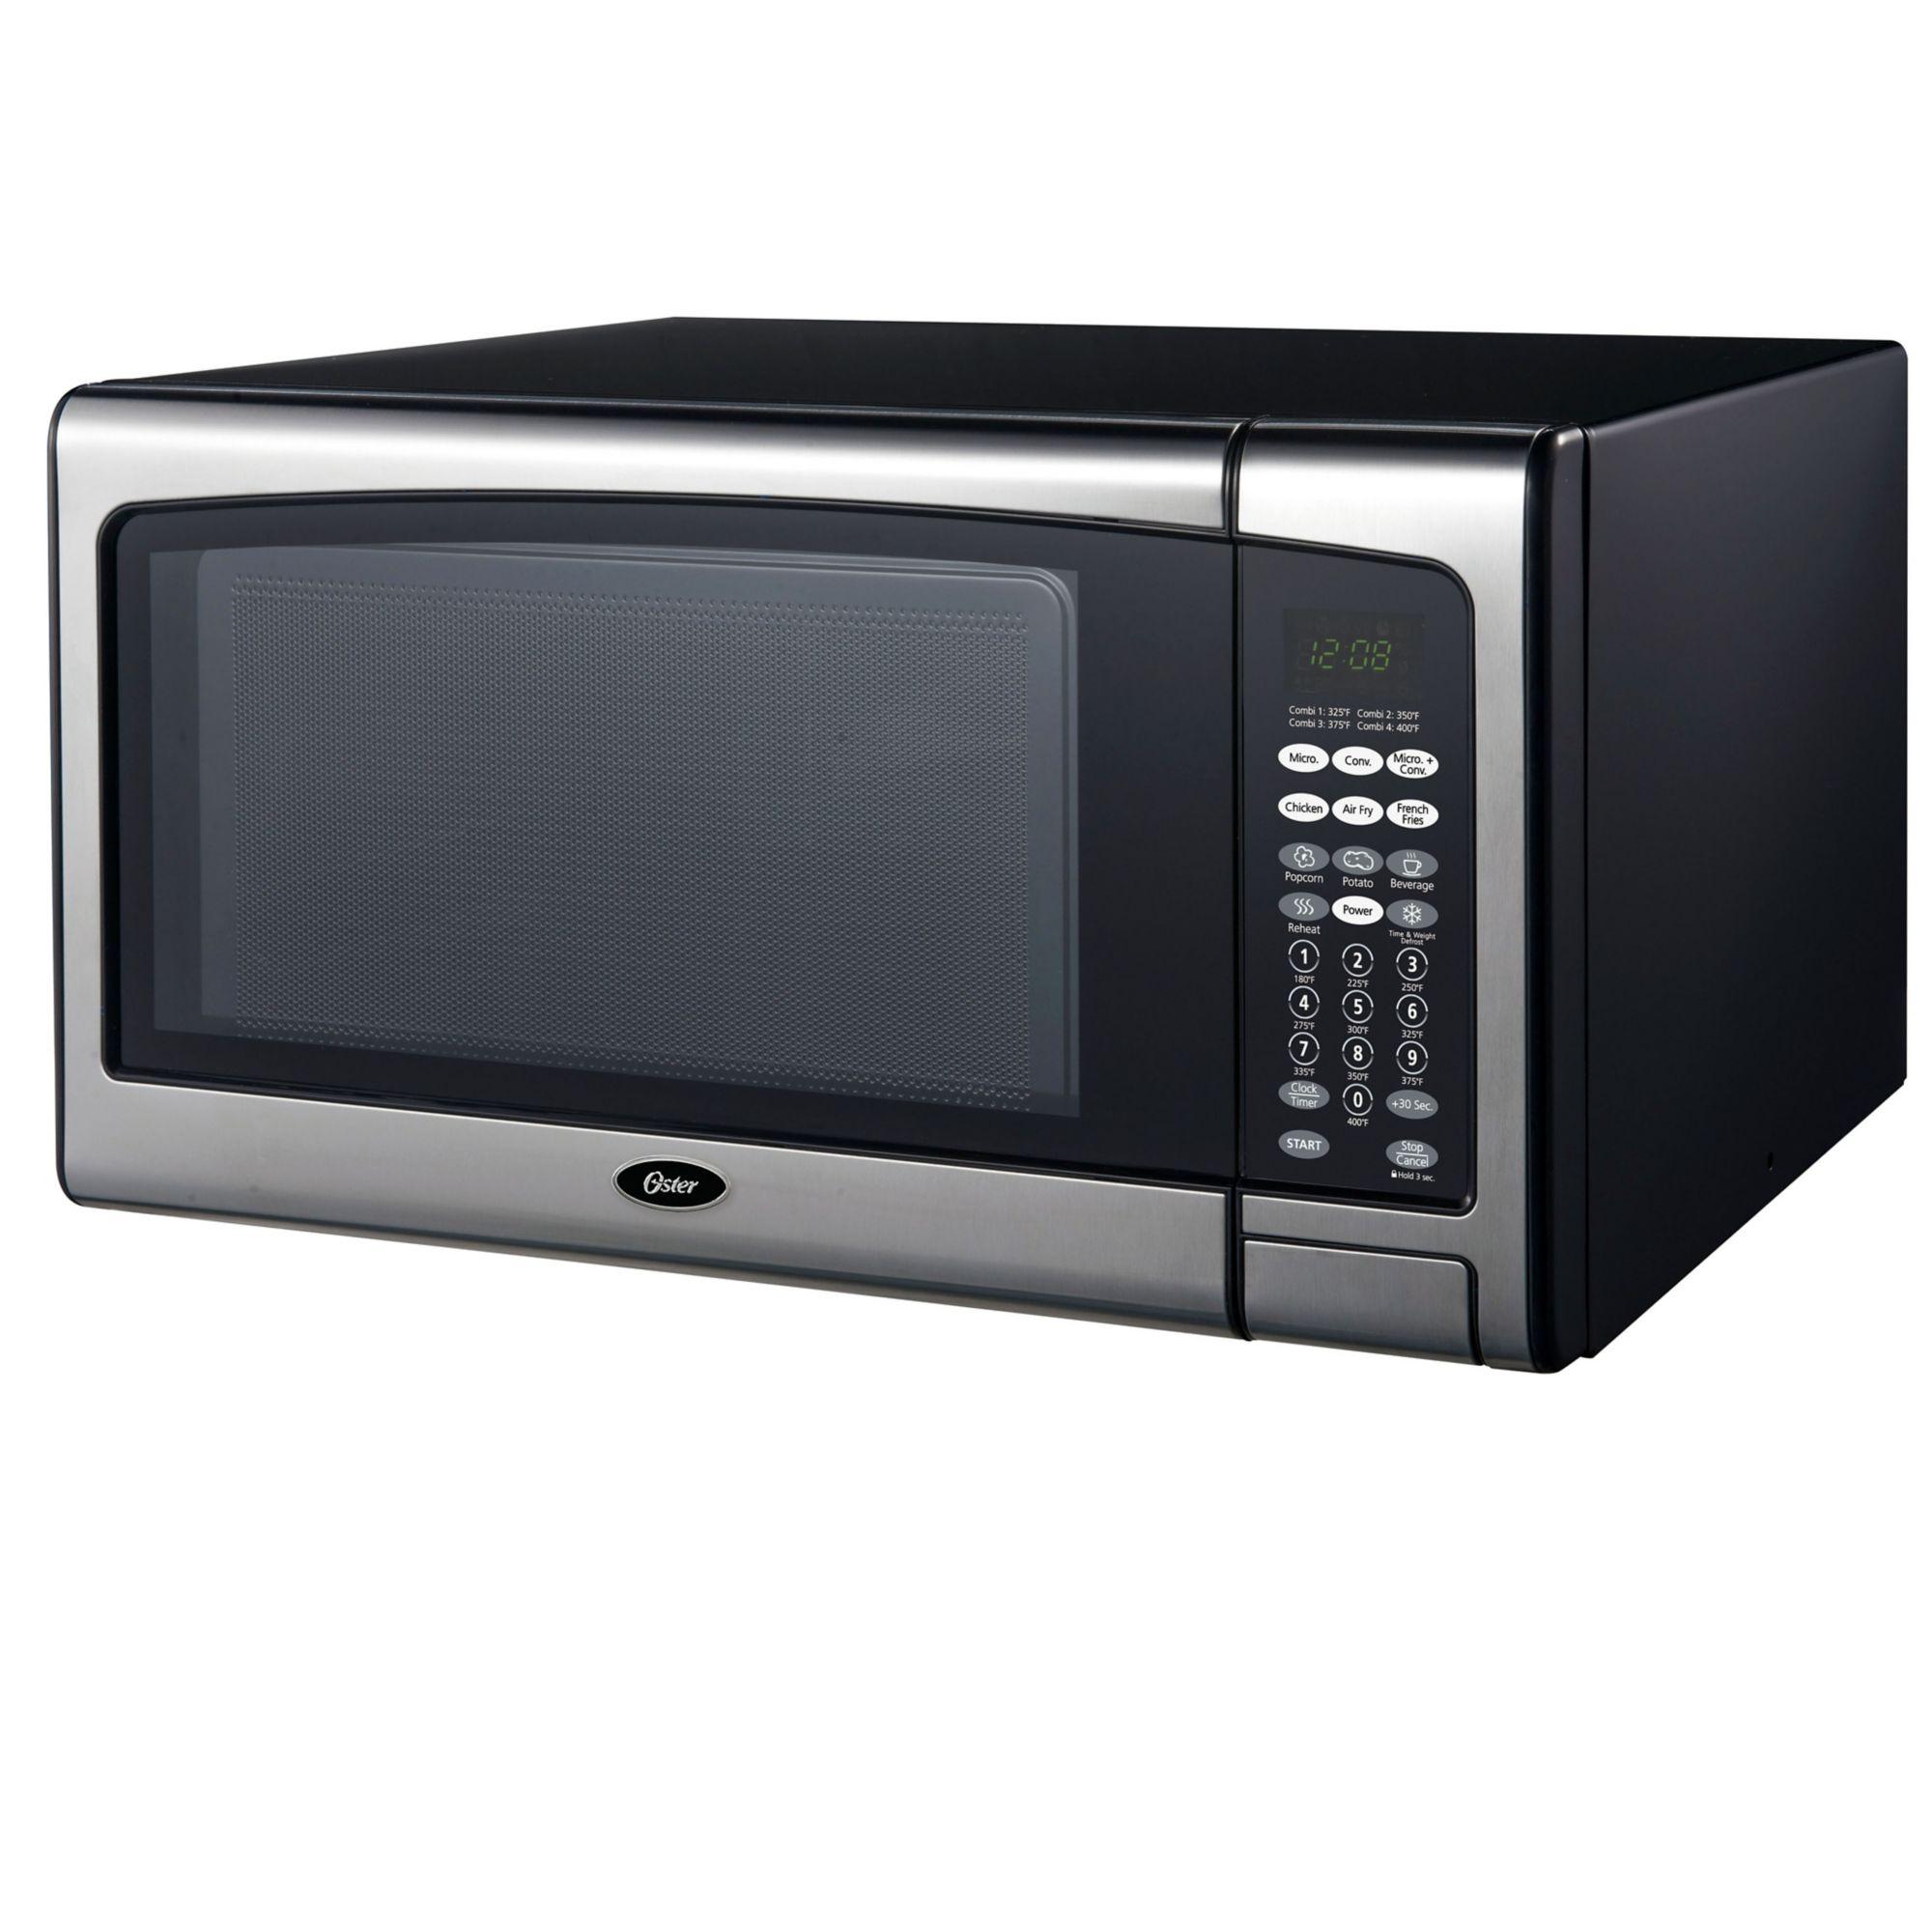 Oster 1.1 cu ft 1100W Digital Microwave